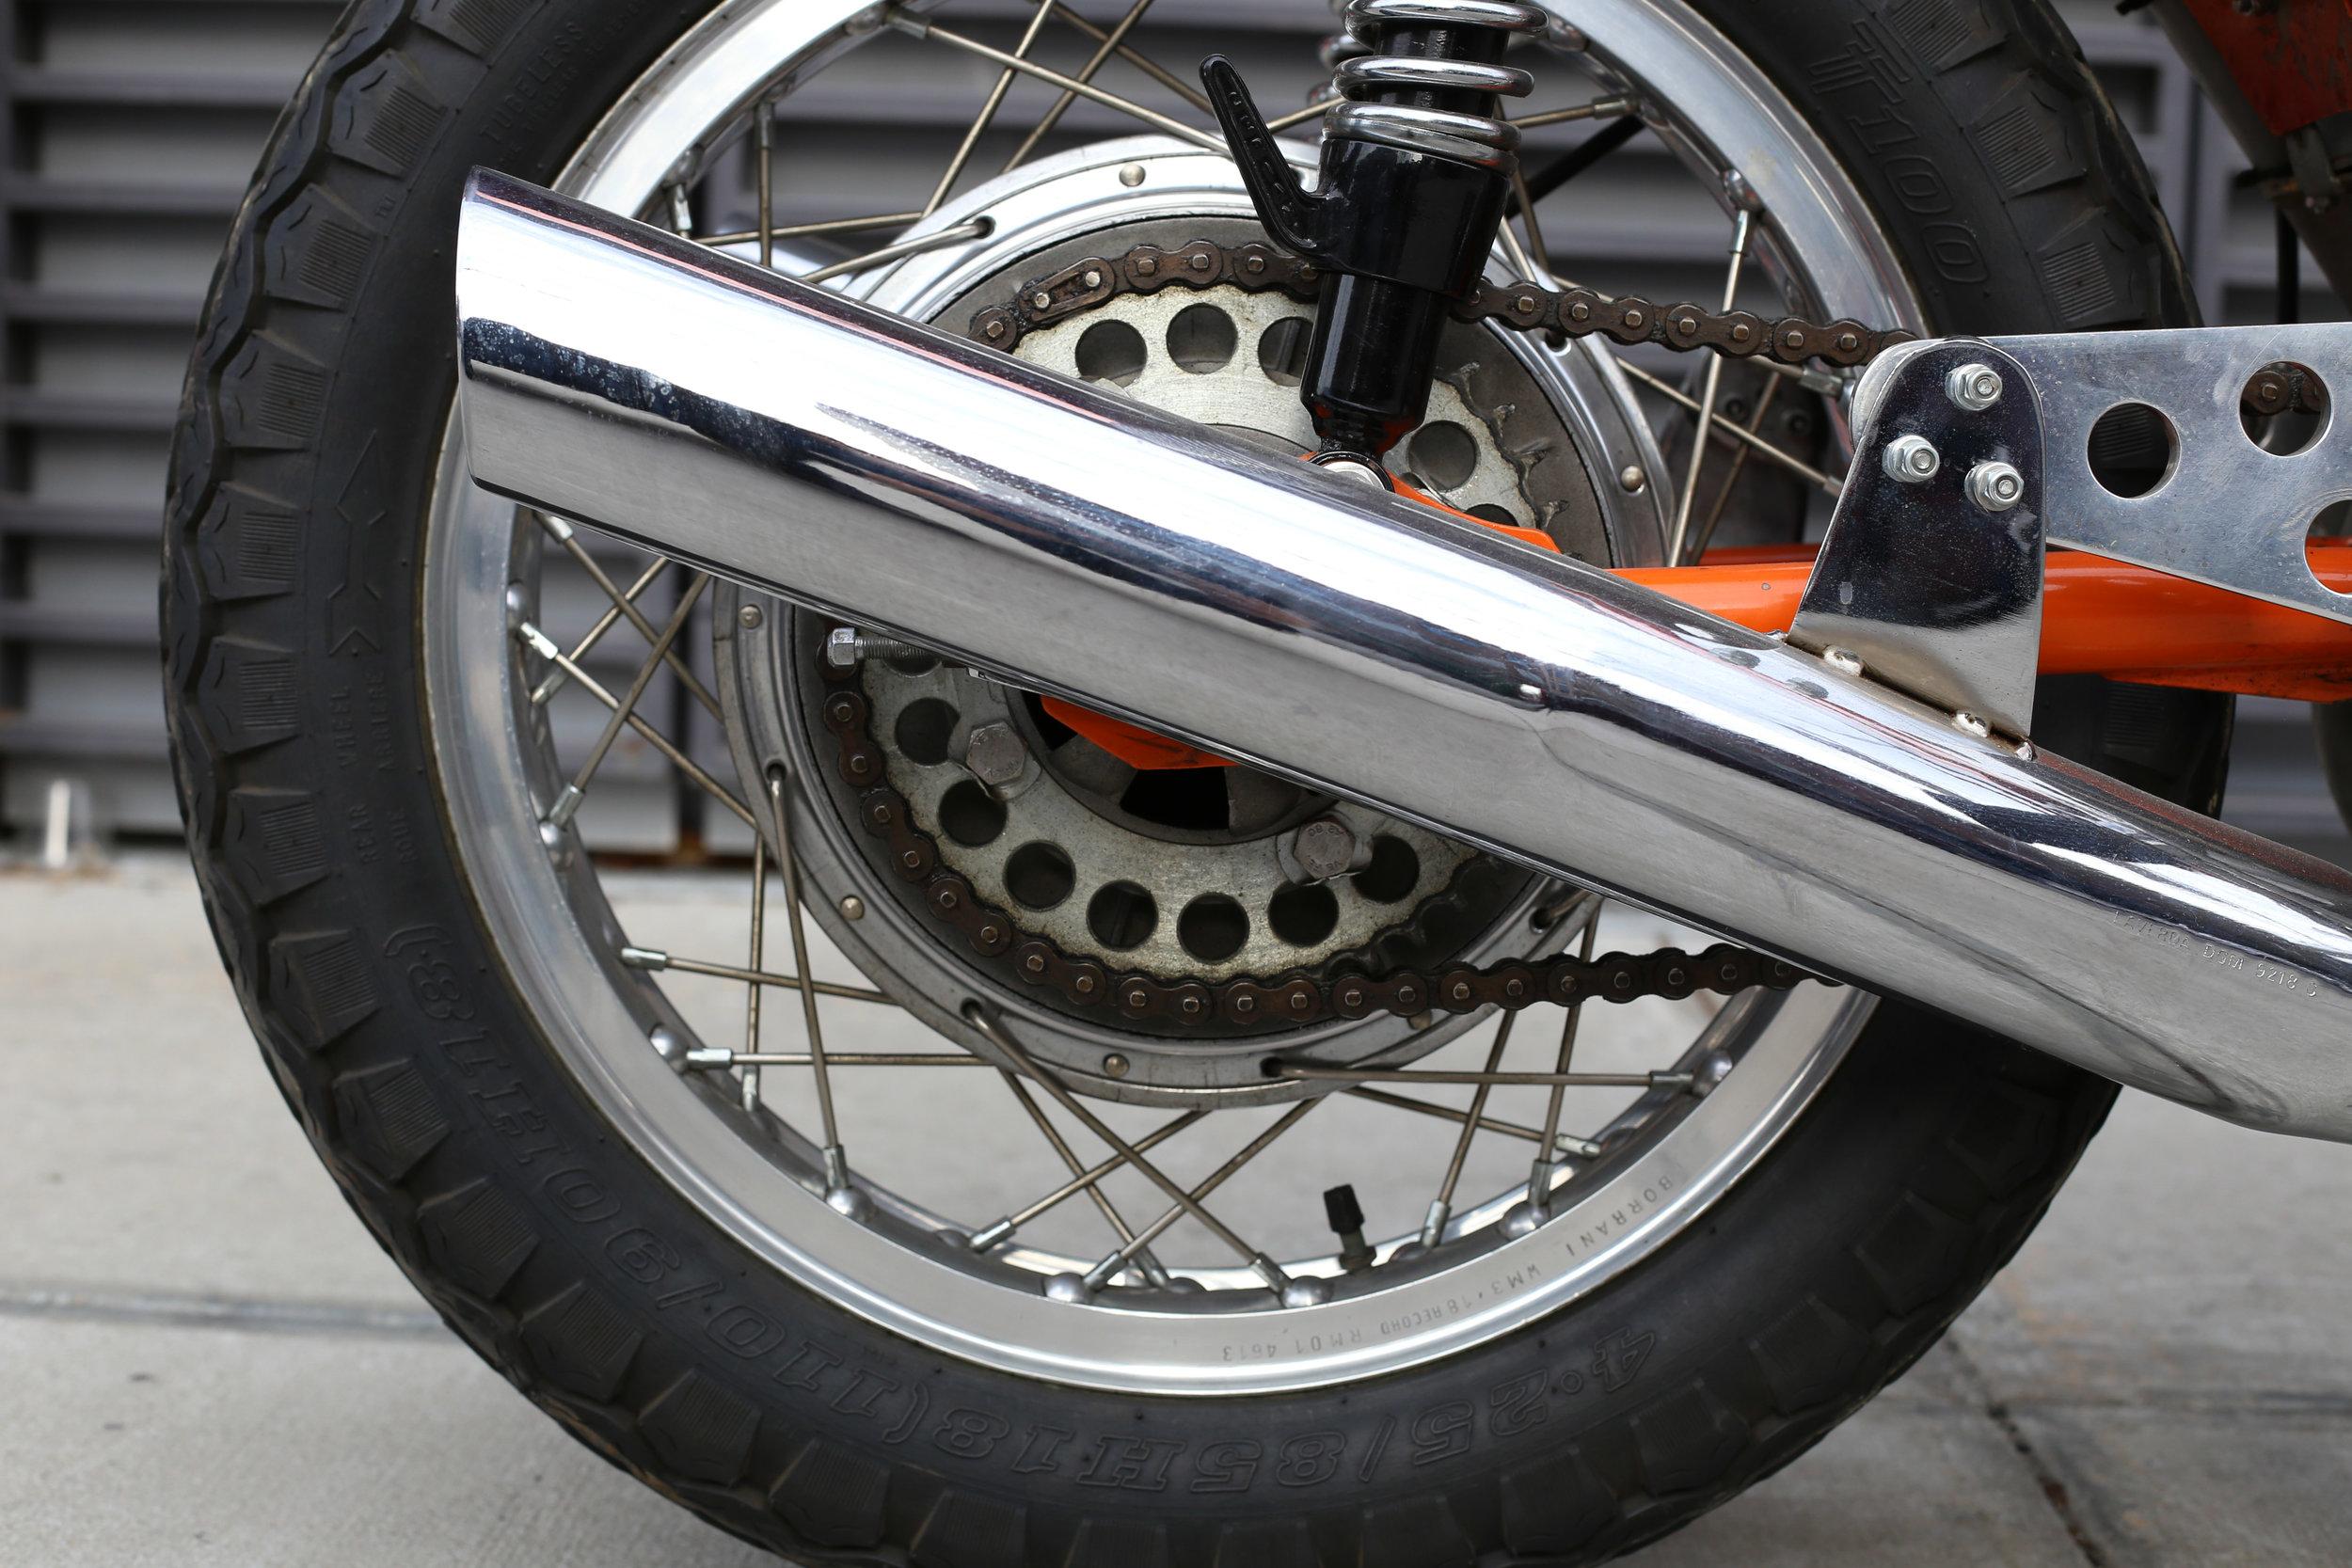 Laverda SFC Rear Wheel